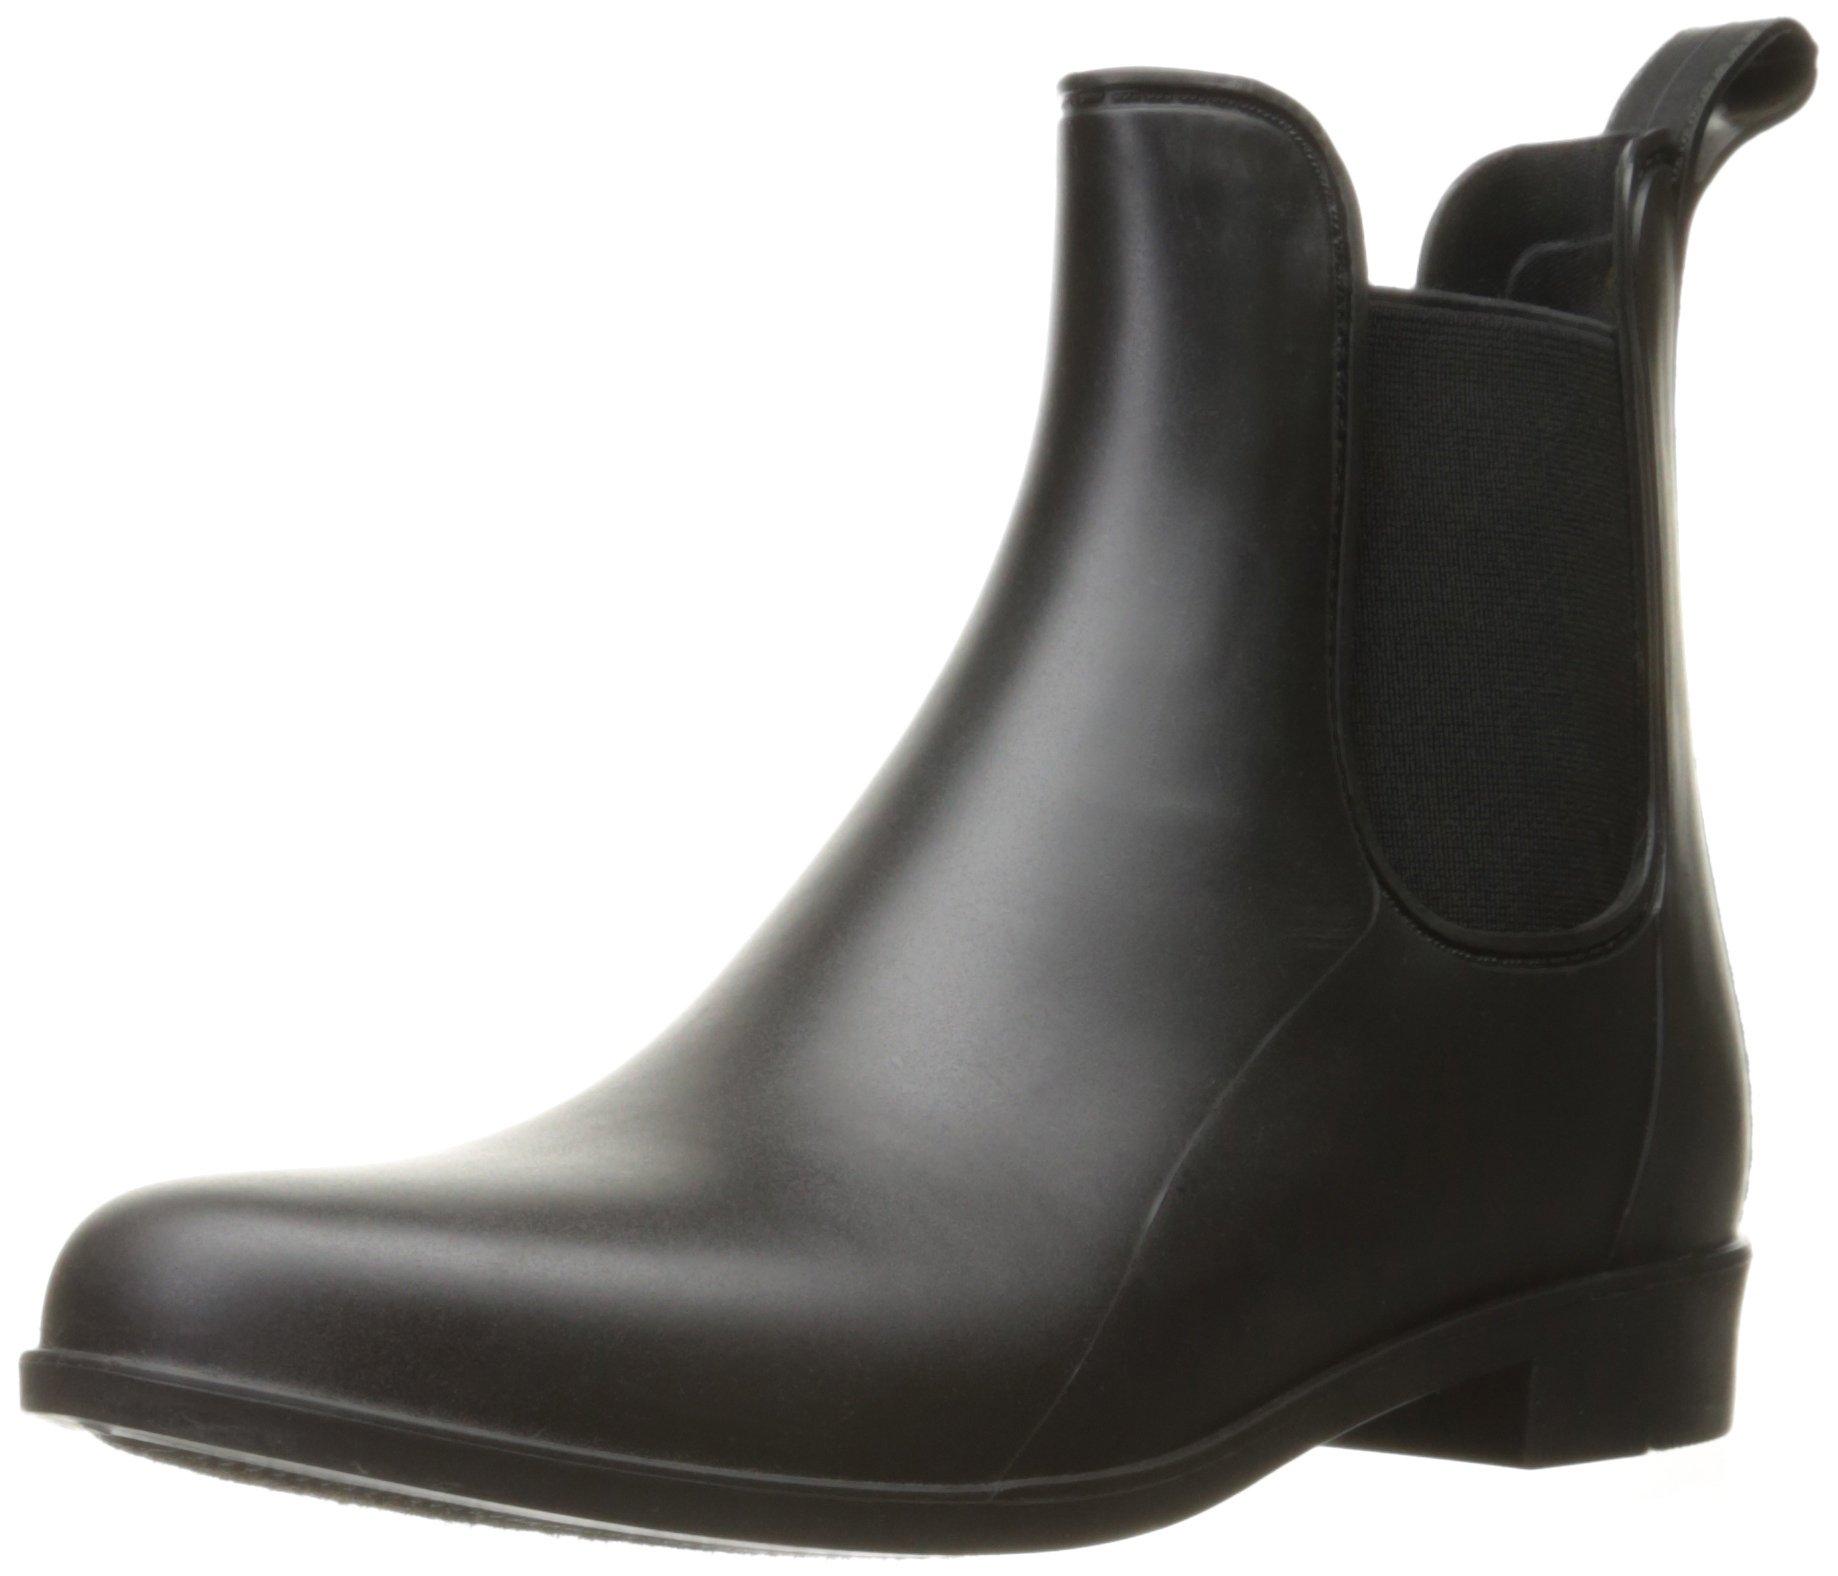 Sam Edelman Women's Tinsley Rain Boot, Black Matte, 8 M US by Sam Edelman